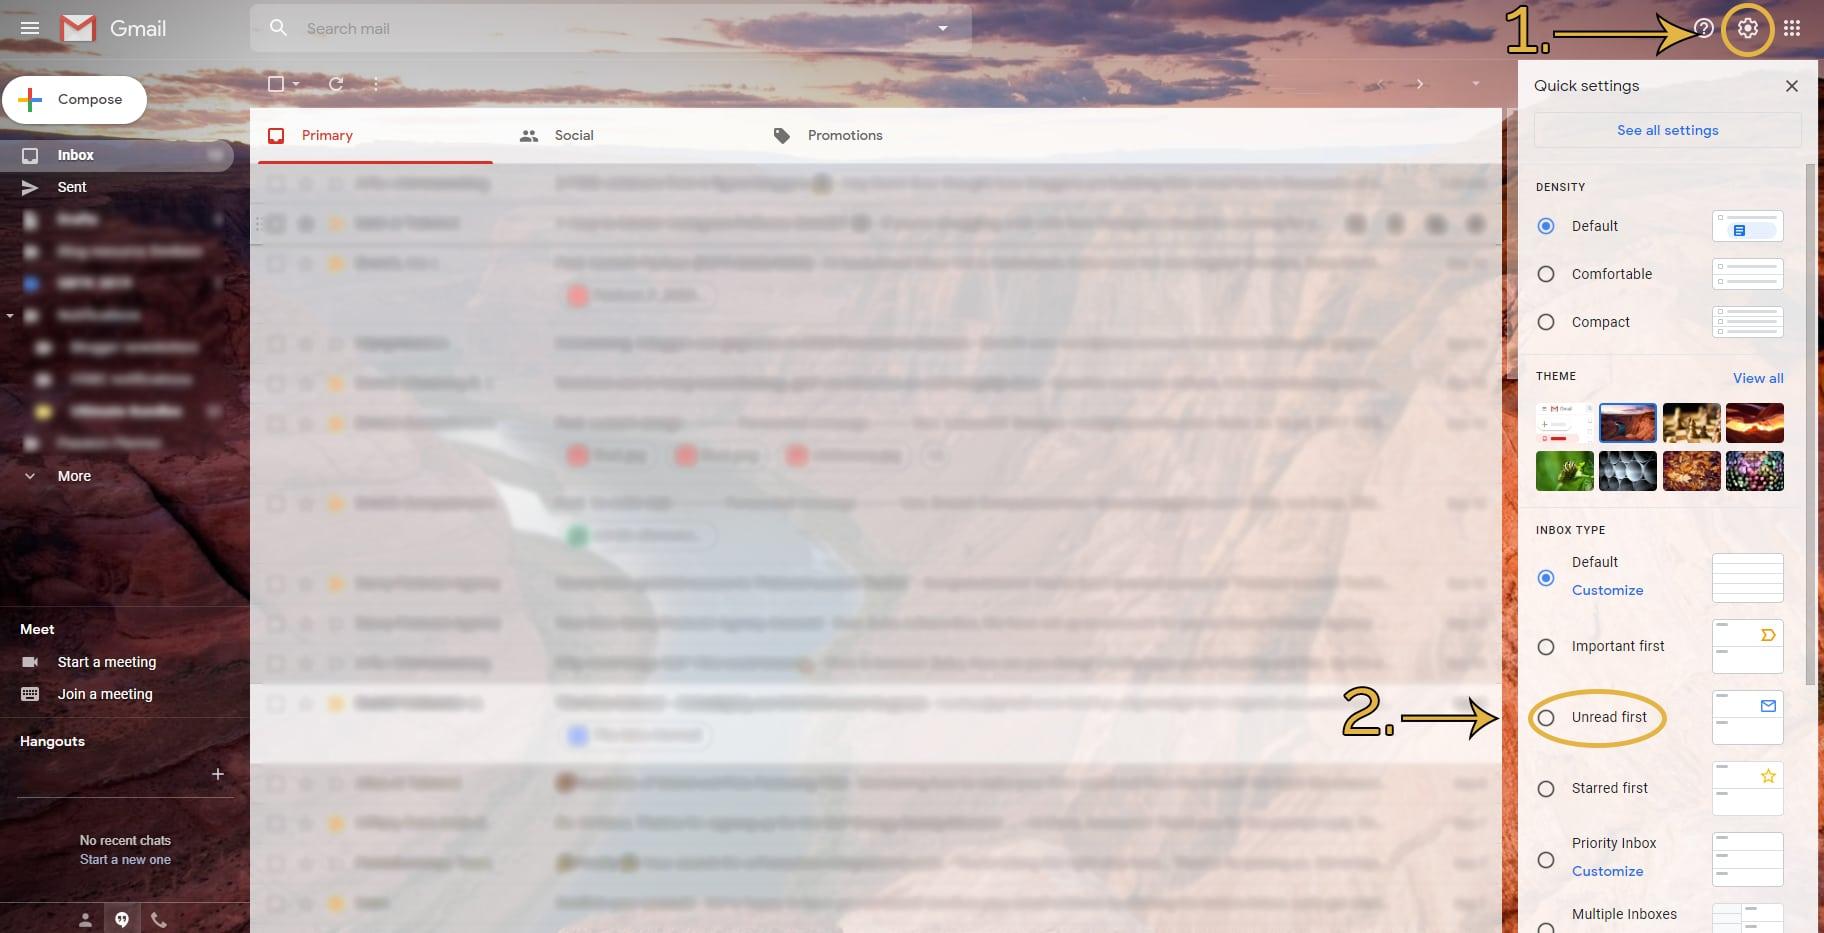 Gmail inbox settings